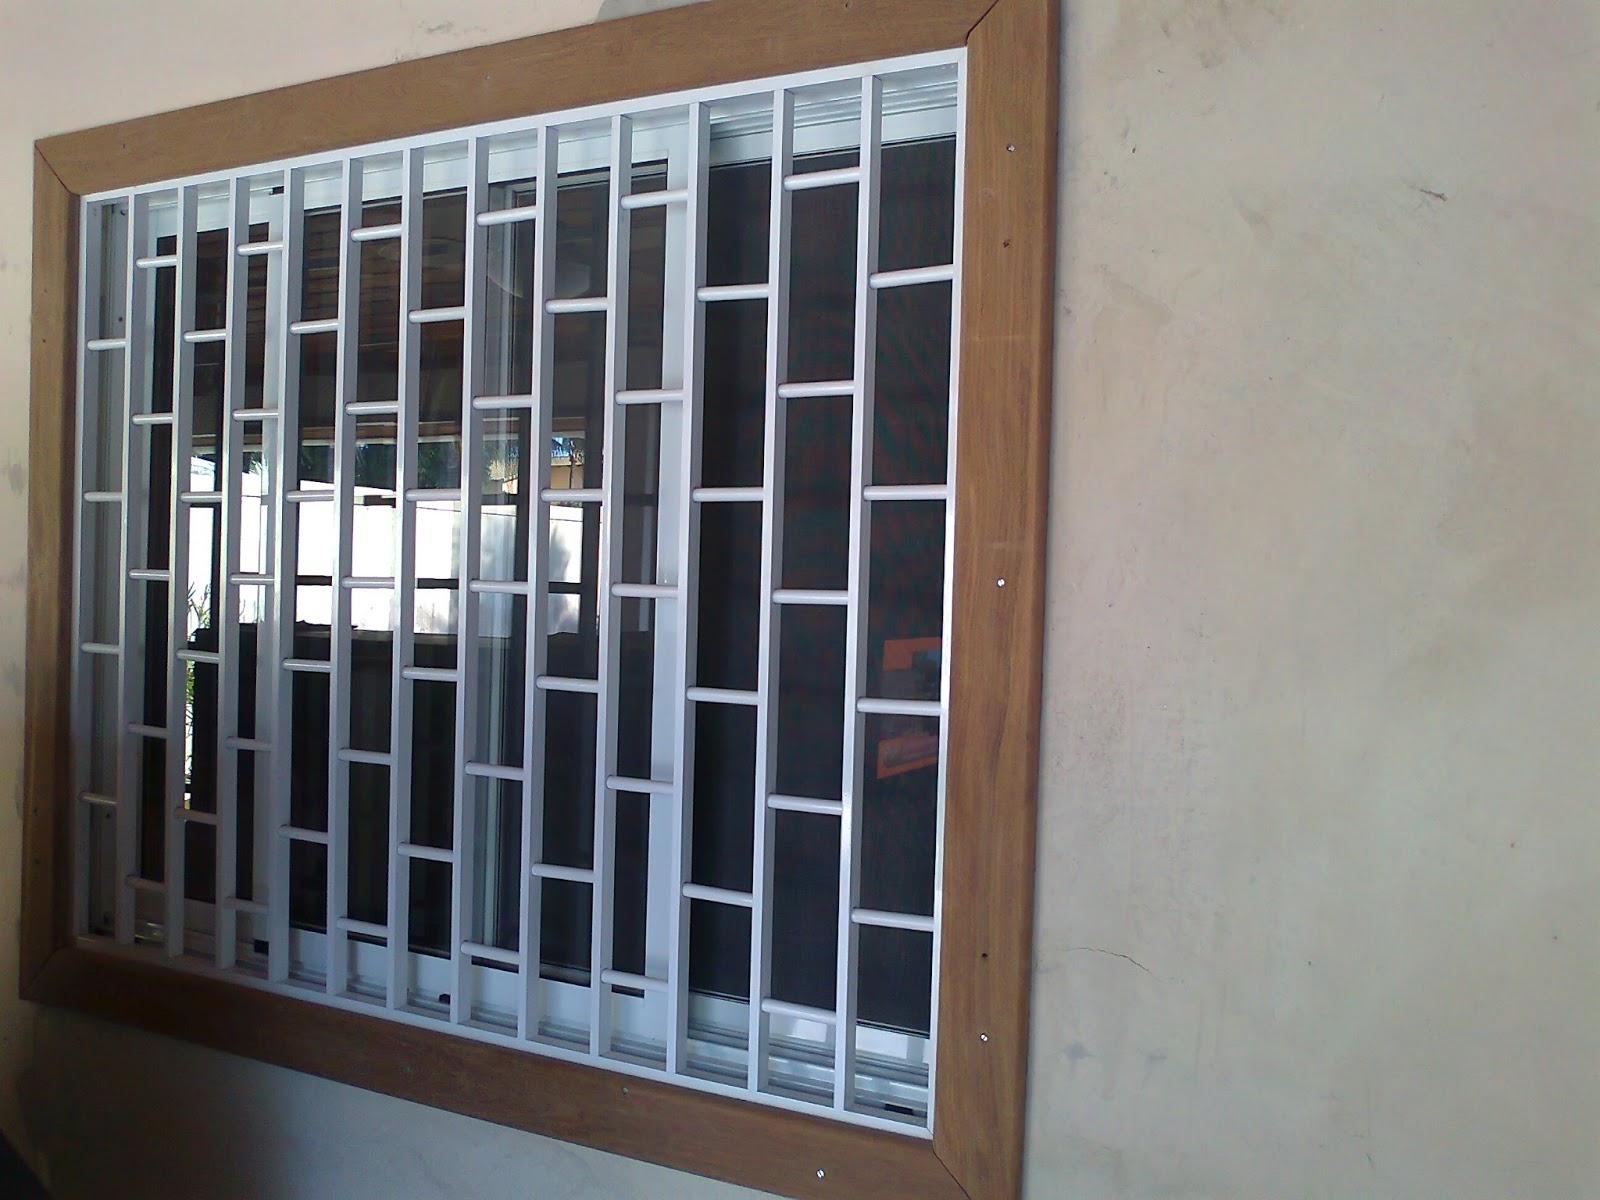 #7D6049 ESQUADRIAS ALUMINIO E FERRO: Esquadrias Aluminio e Ferro Rj 1002 Portas E Janelas De Aluminio Baratas No Rj